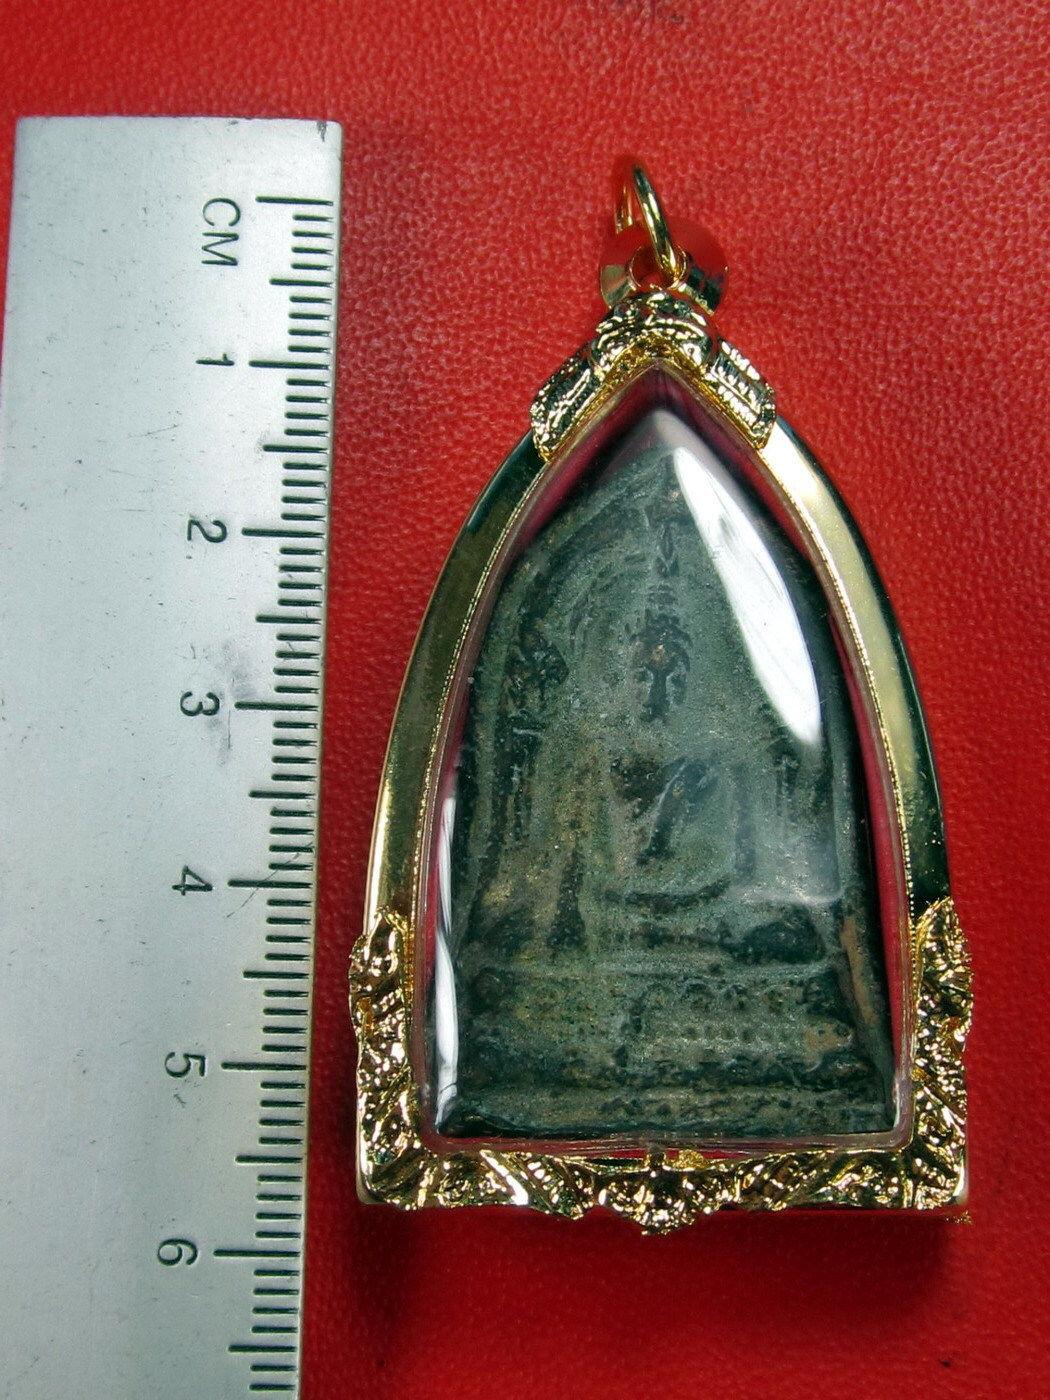 VERY RARE HOLY PHRA BUDDHA-CHIN-NARAT-BAI-SEMA 300 YEAR TOP THAI BUDDHA AMULETS